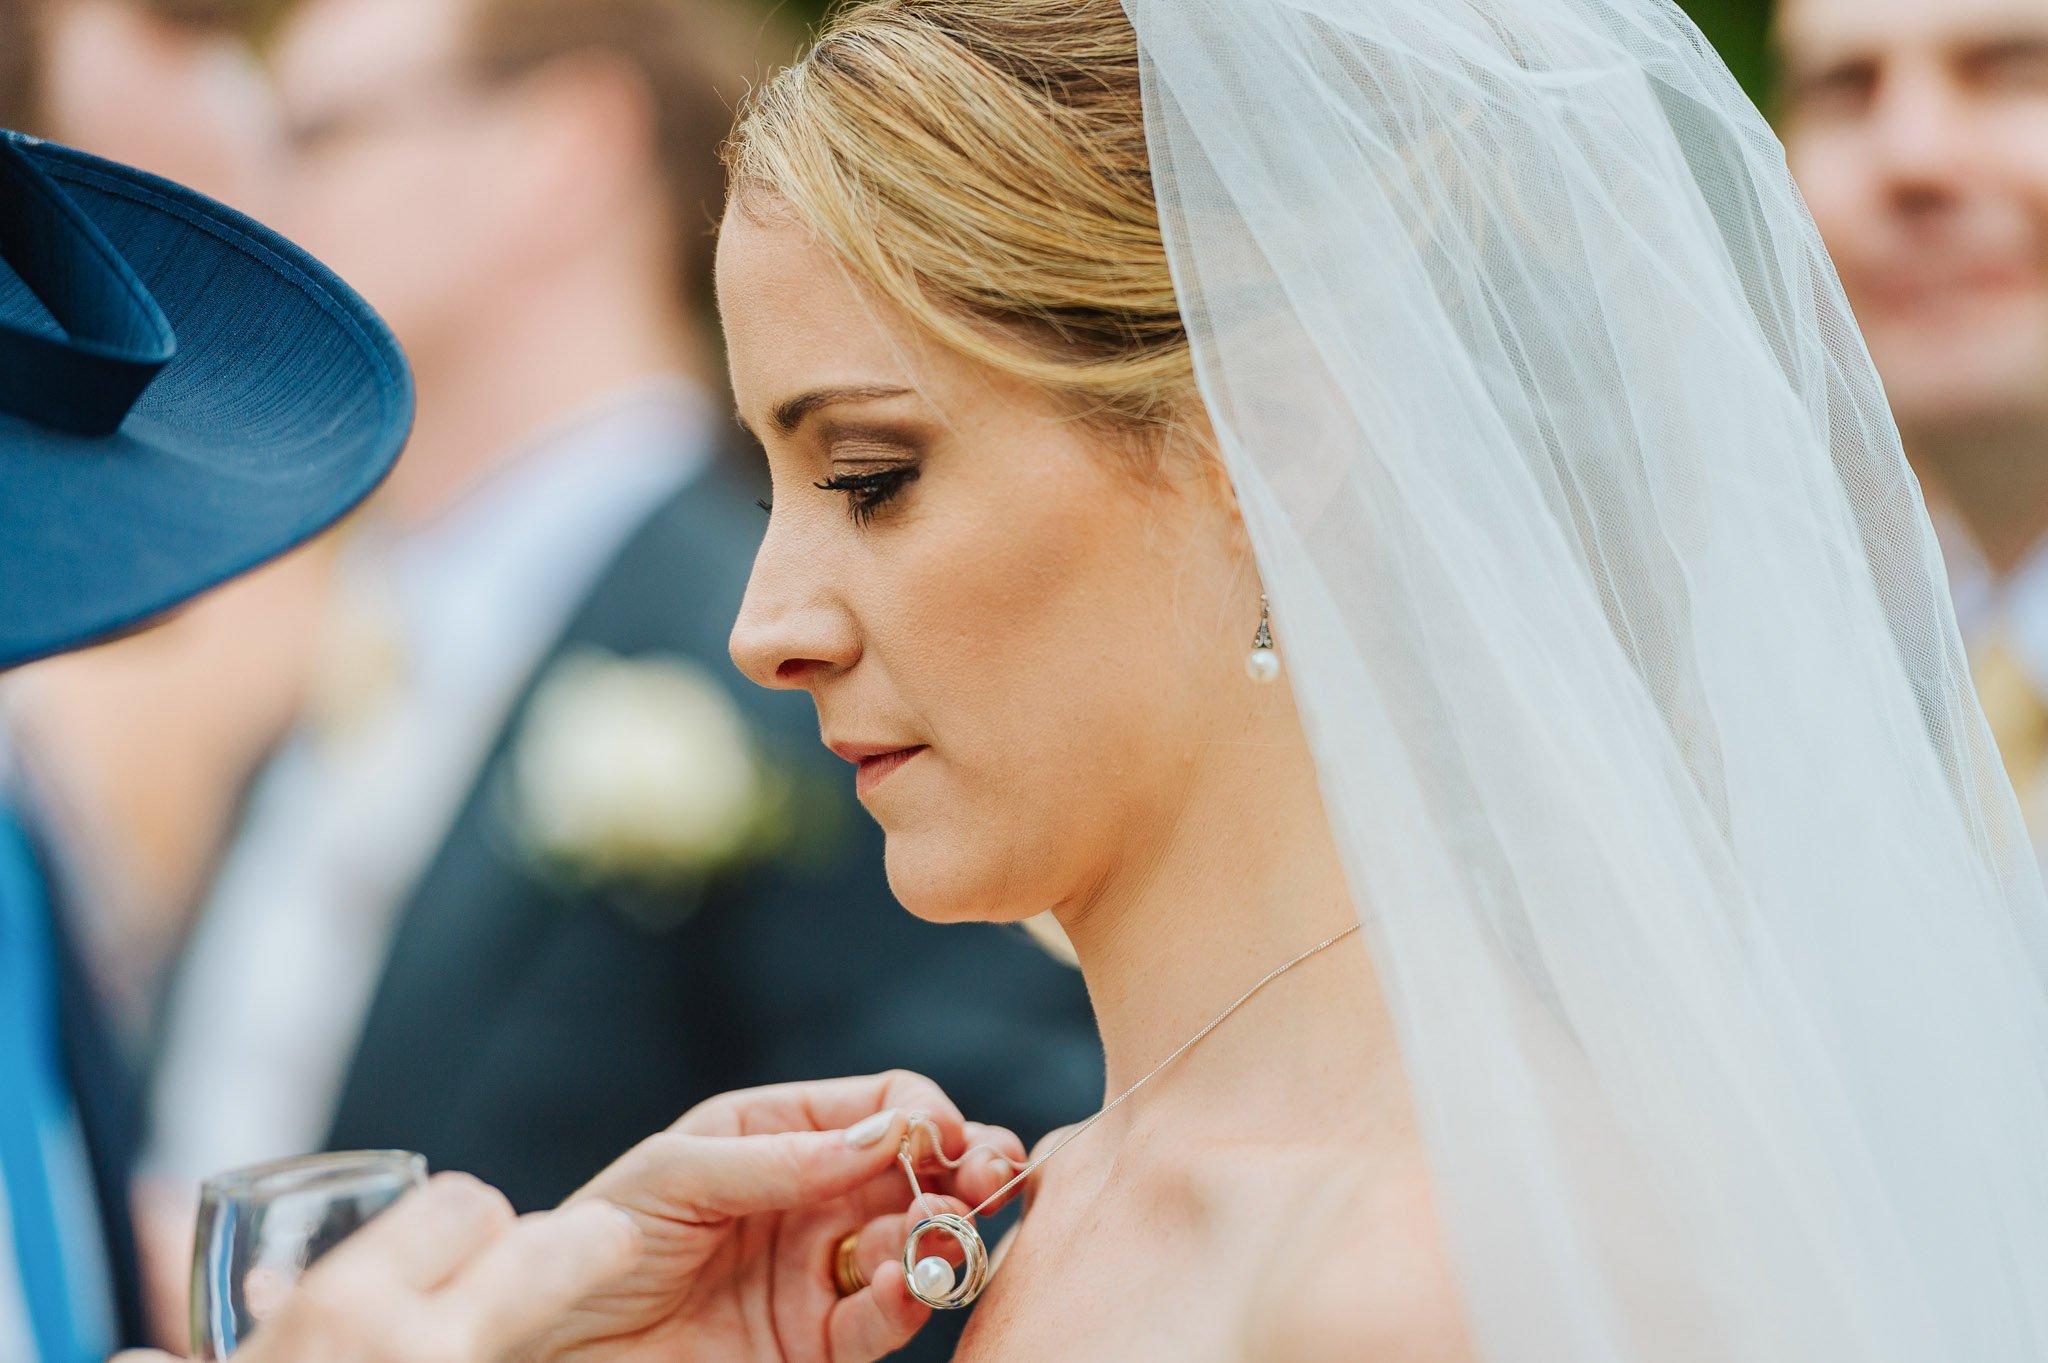 Georgina + Mike - Wedding photography in Malvern, Worcestershire 61